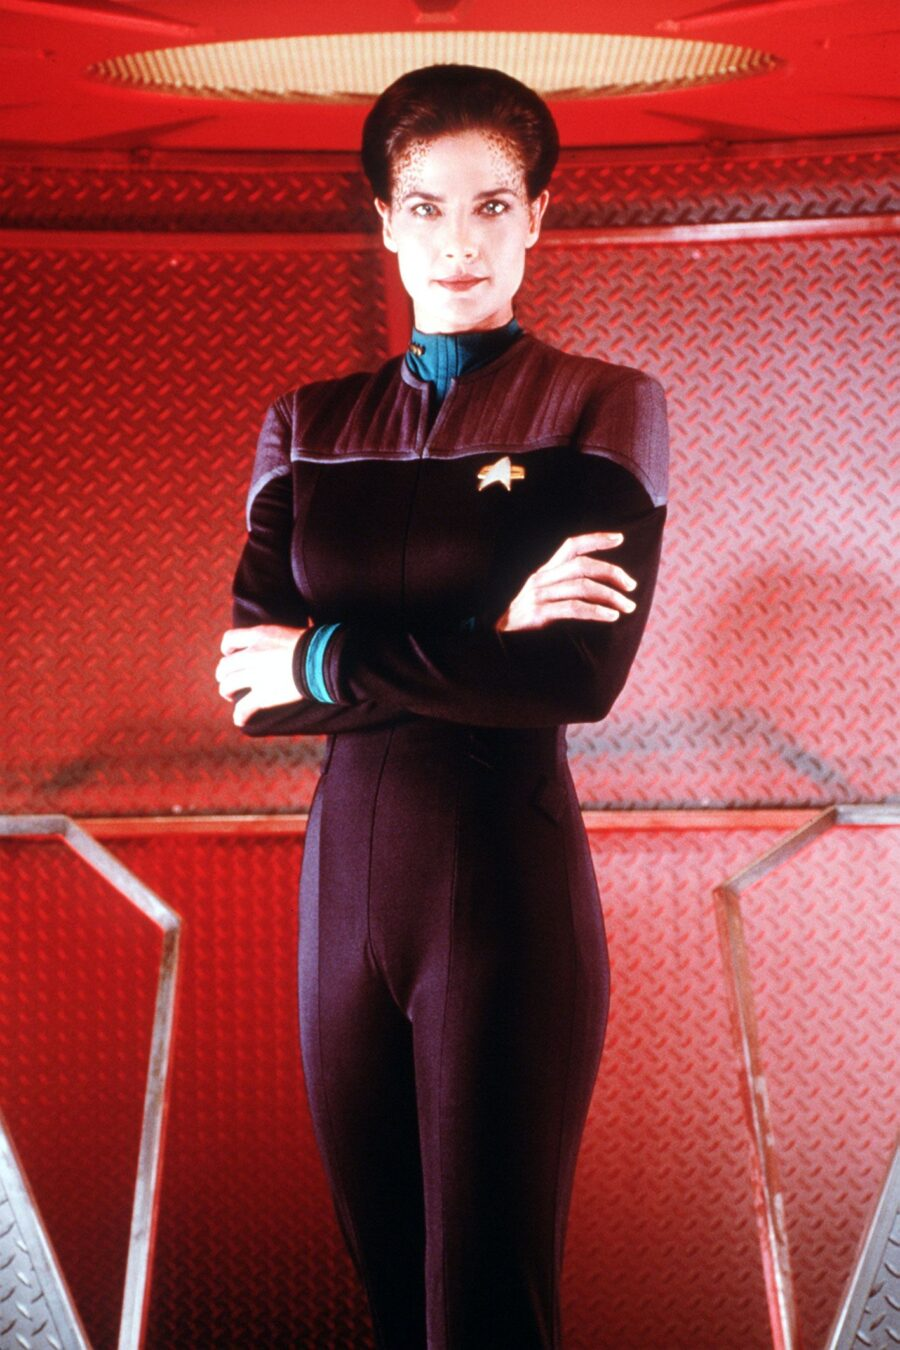 Star Trek's Dax